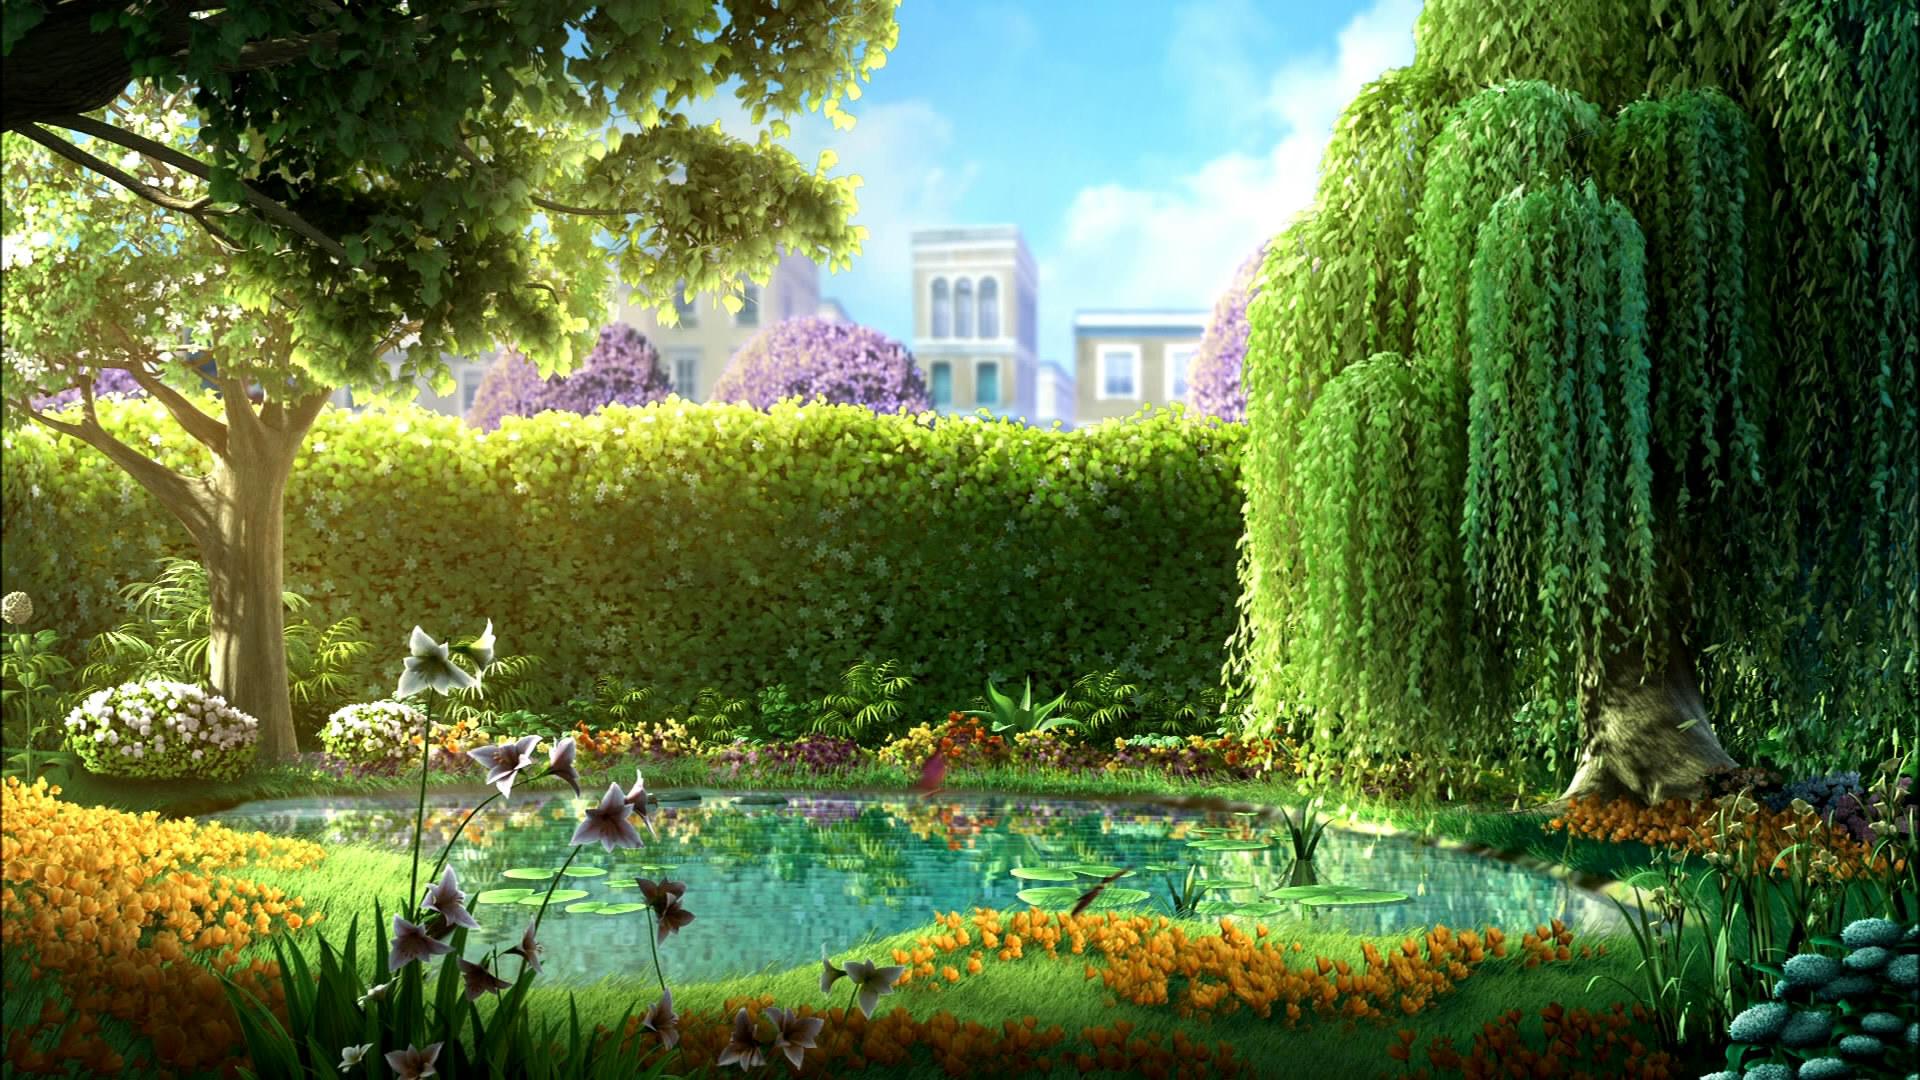 1920X1080 HD Garden WallpaperWallpaperSafari